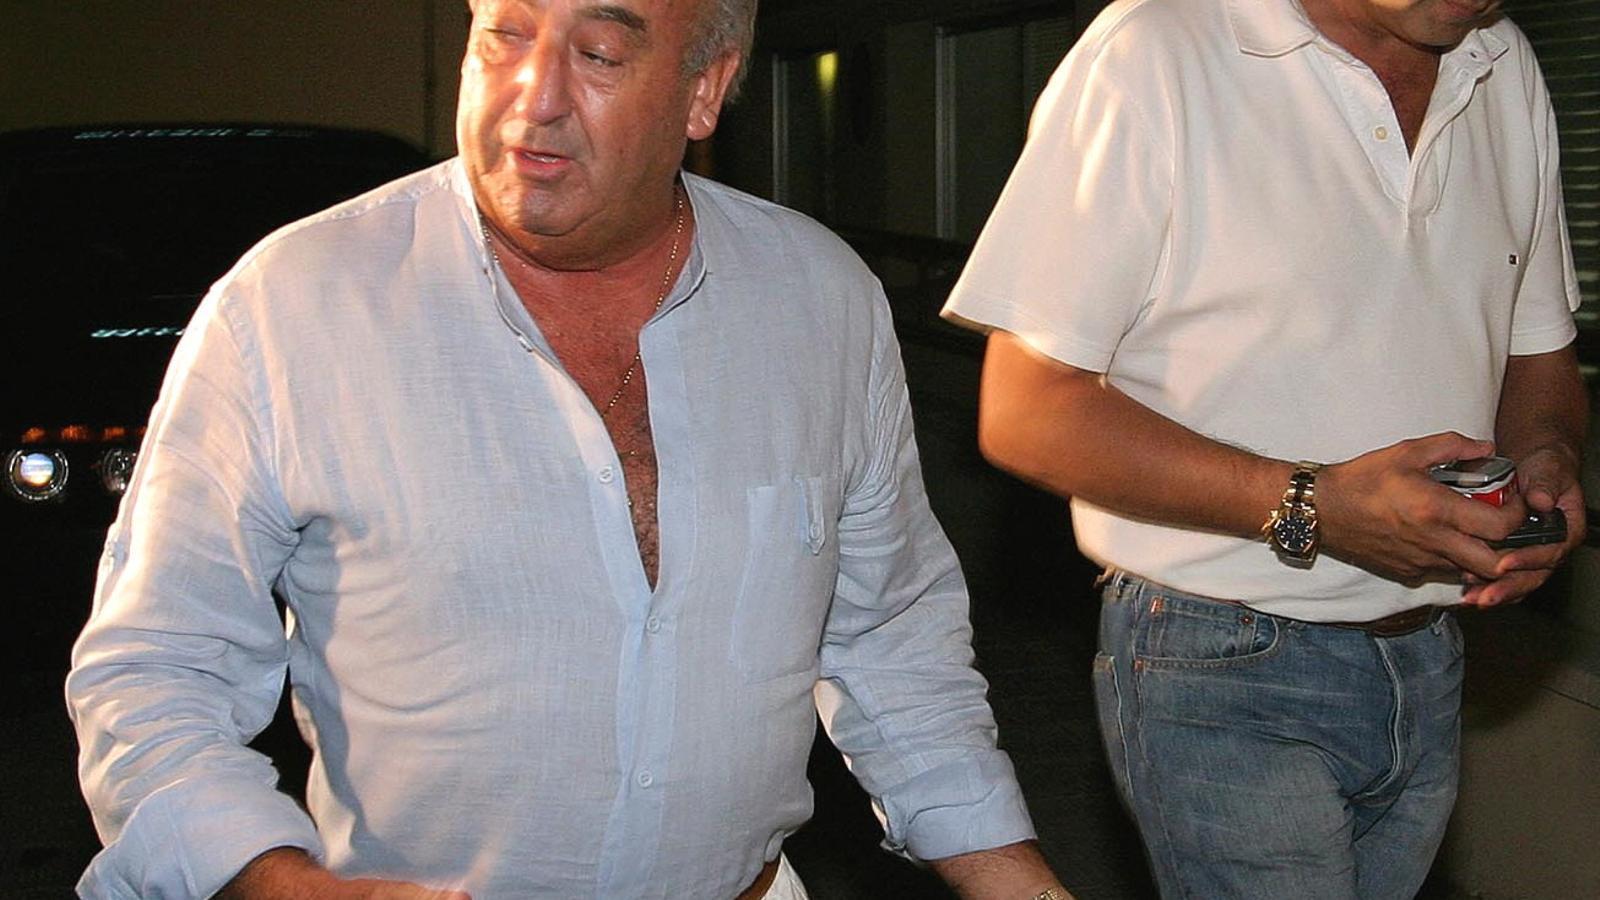 Humberto Janeiro en una imatge d'arxiu